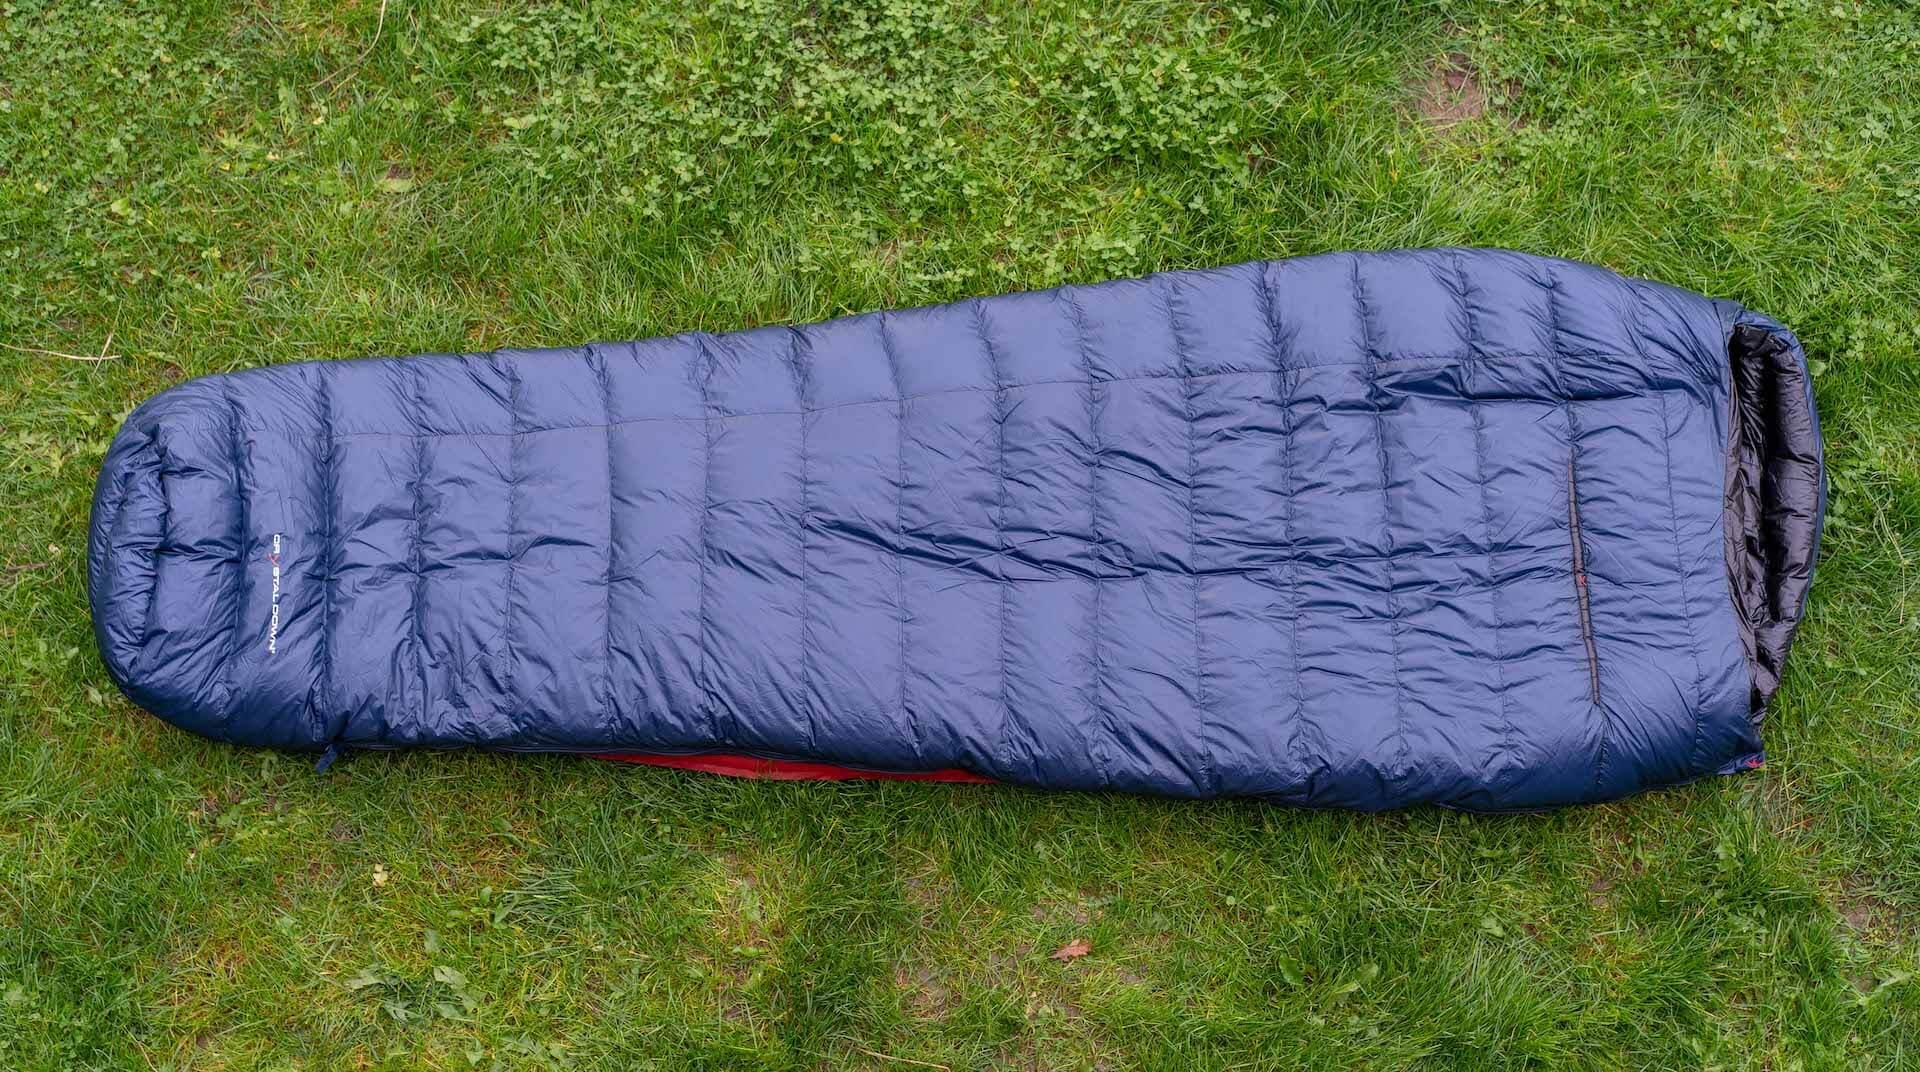 nordisk yeti passion-five schlafsacktest gear-review sleeping-bag gesamtansicht